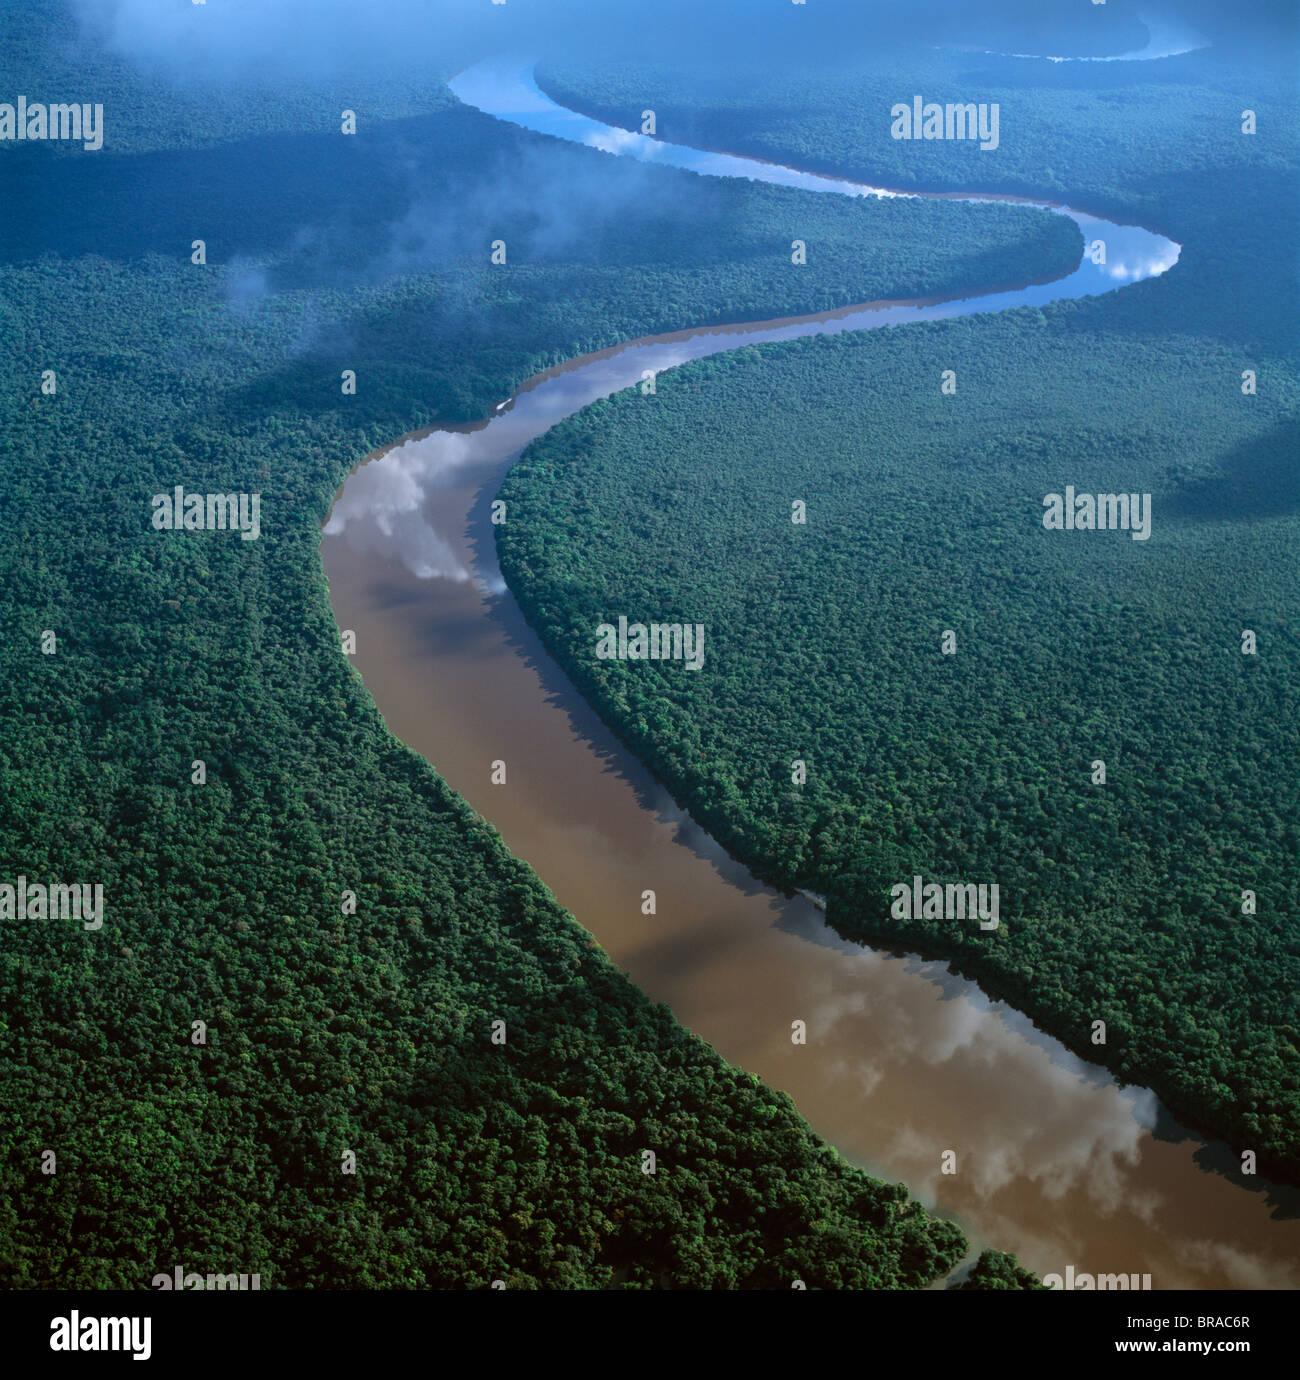 Aerial image of the Lower Mazaruni River south of Oranapai Landing, Guyana, South America - Stock Image